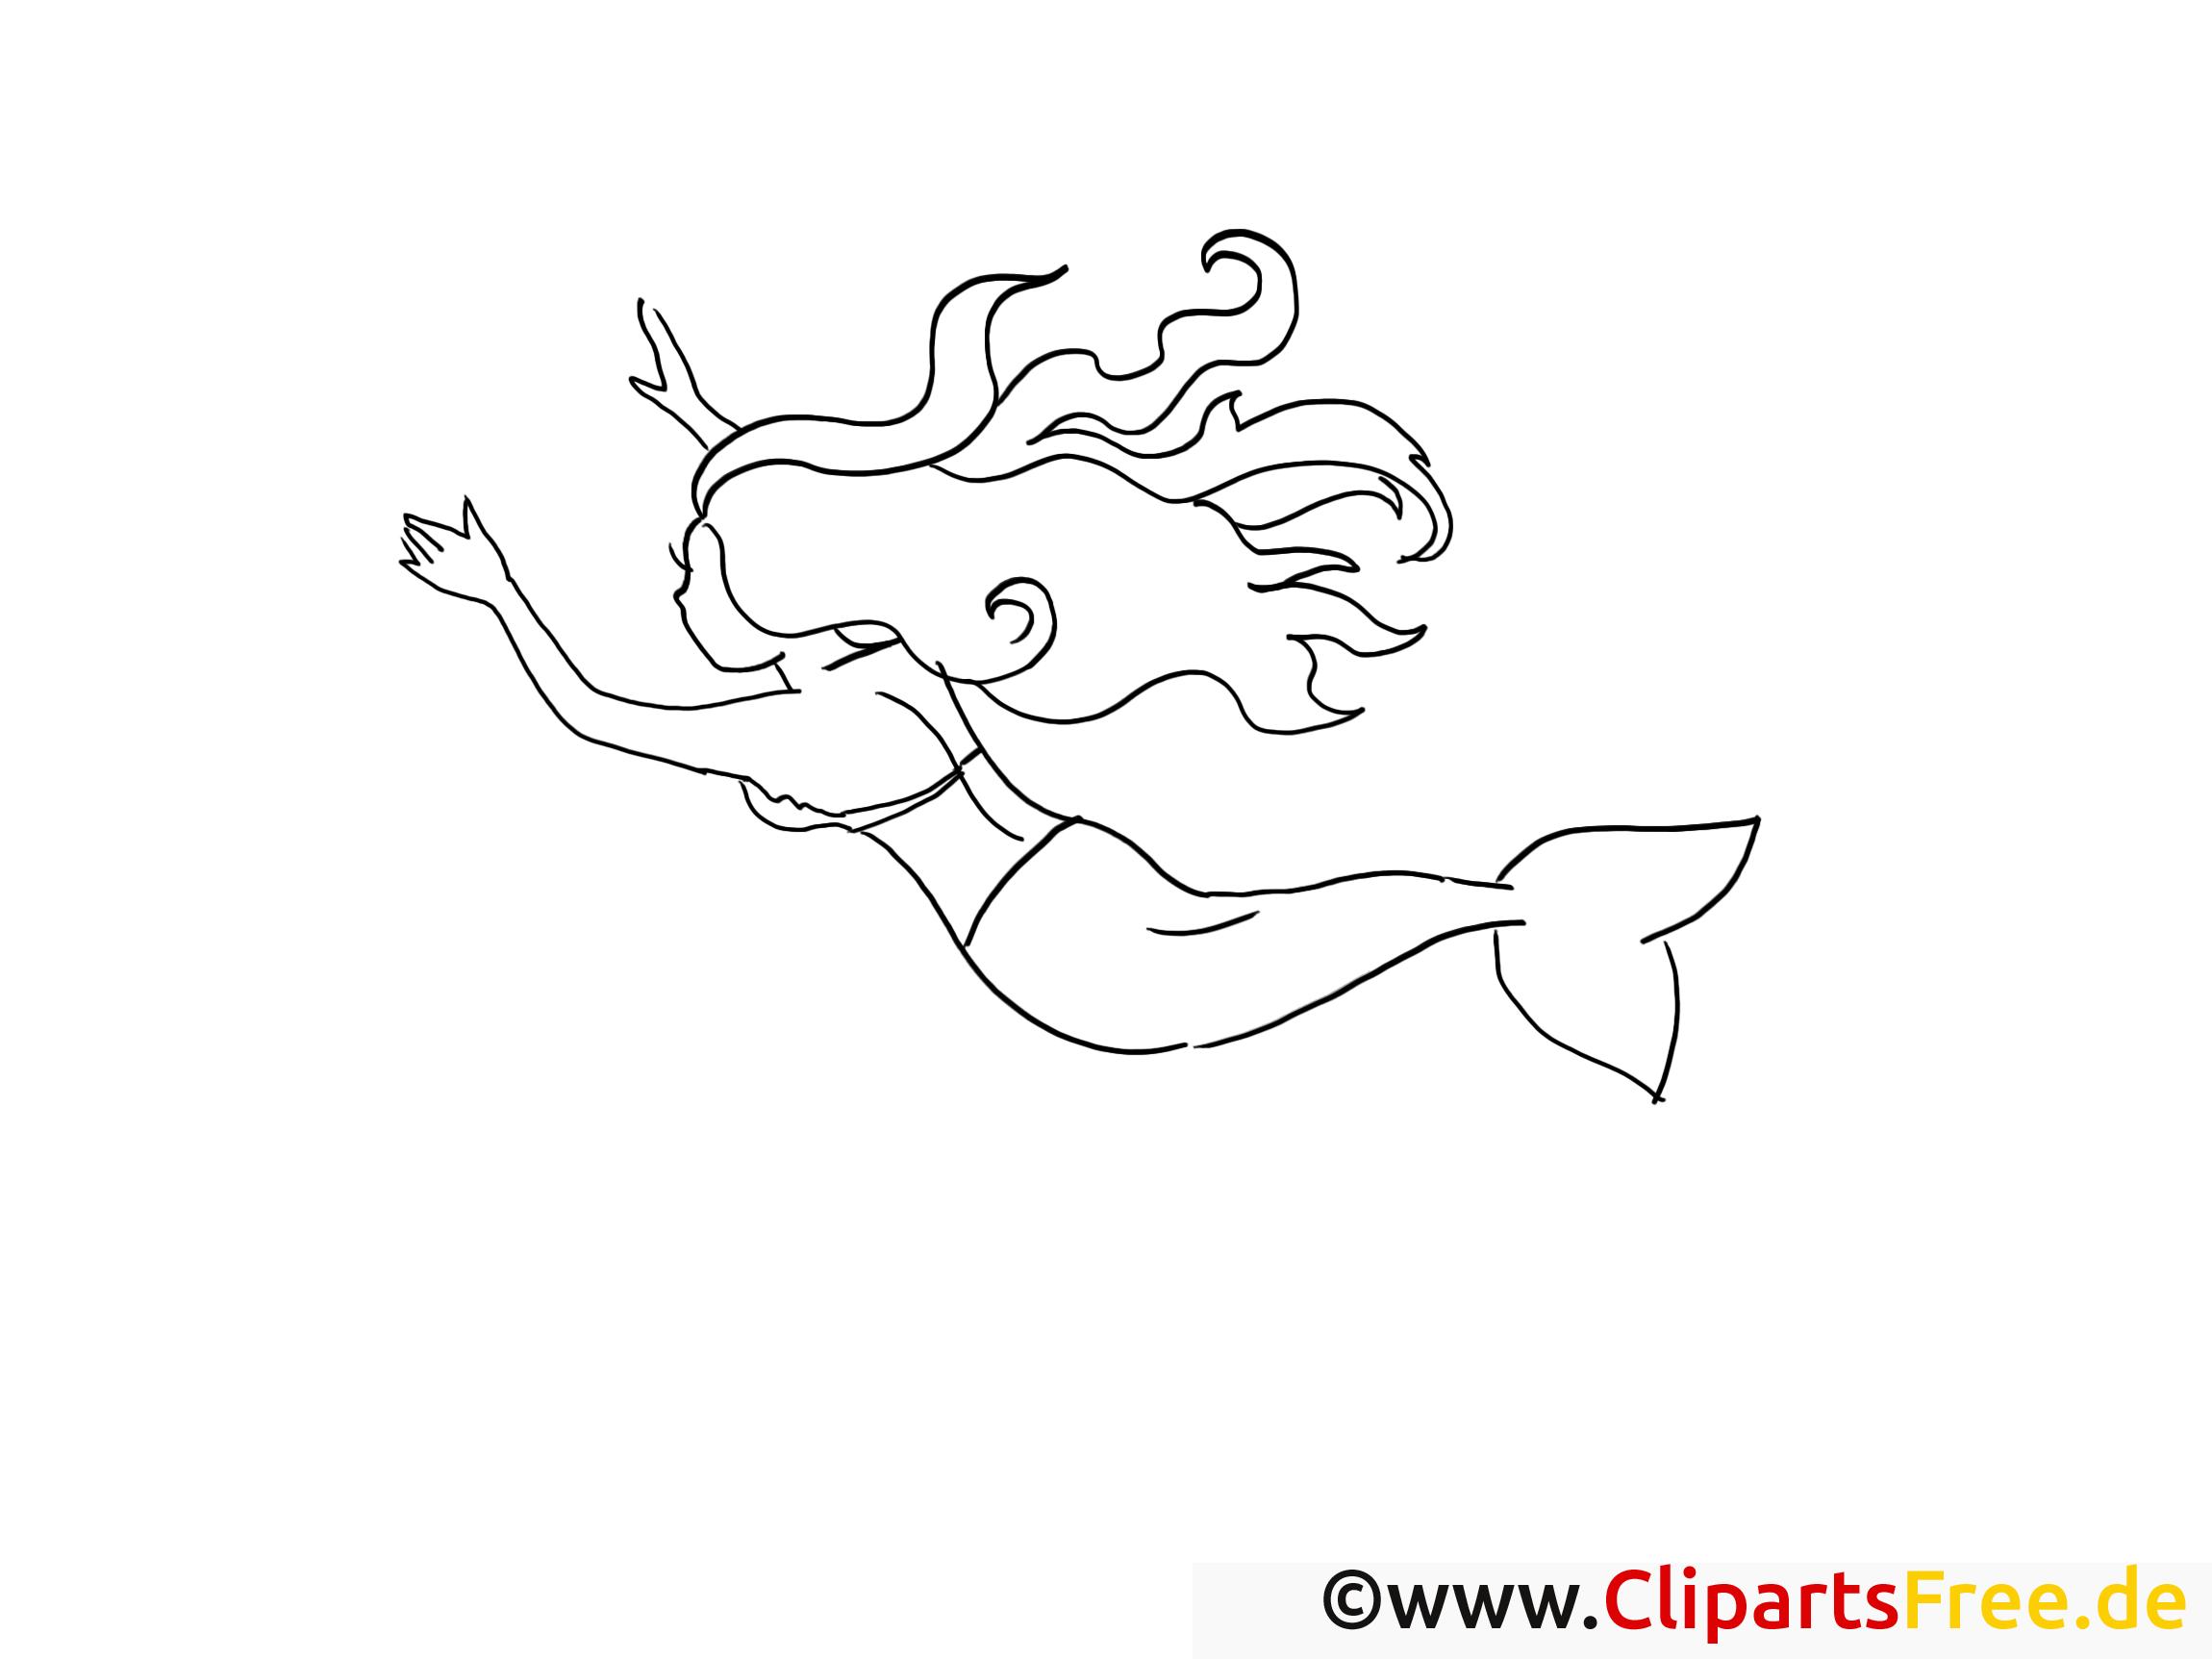 petite sirene dessin  conte gratuits à imprimer  fable